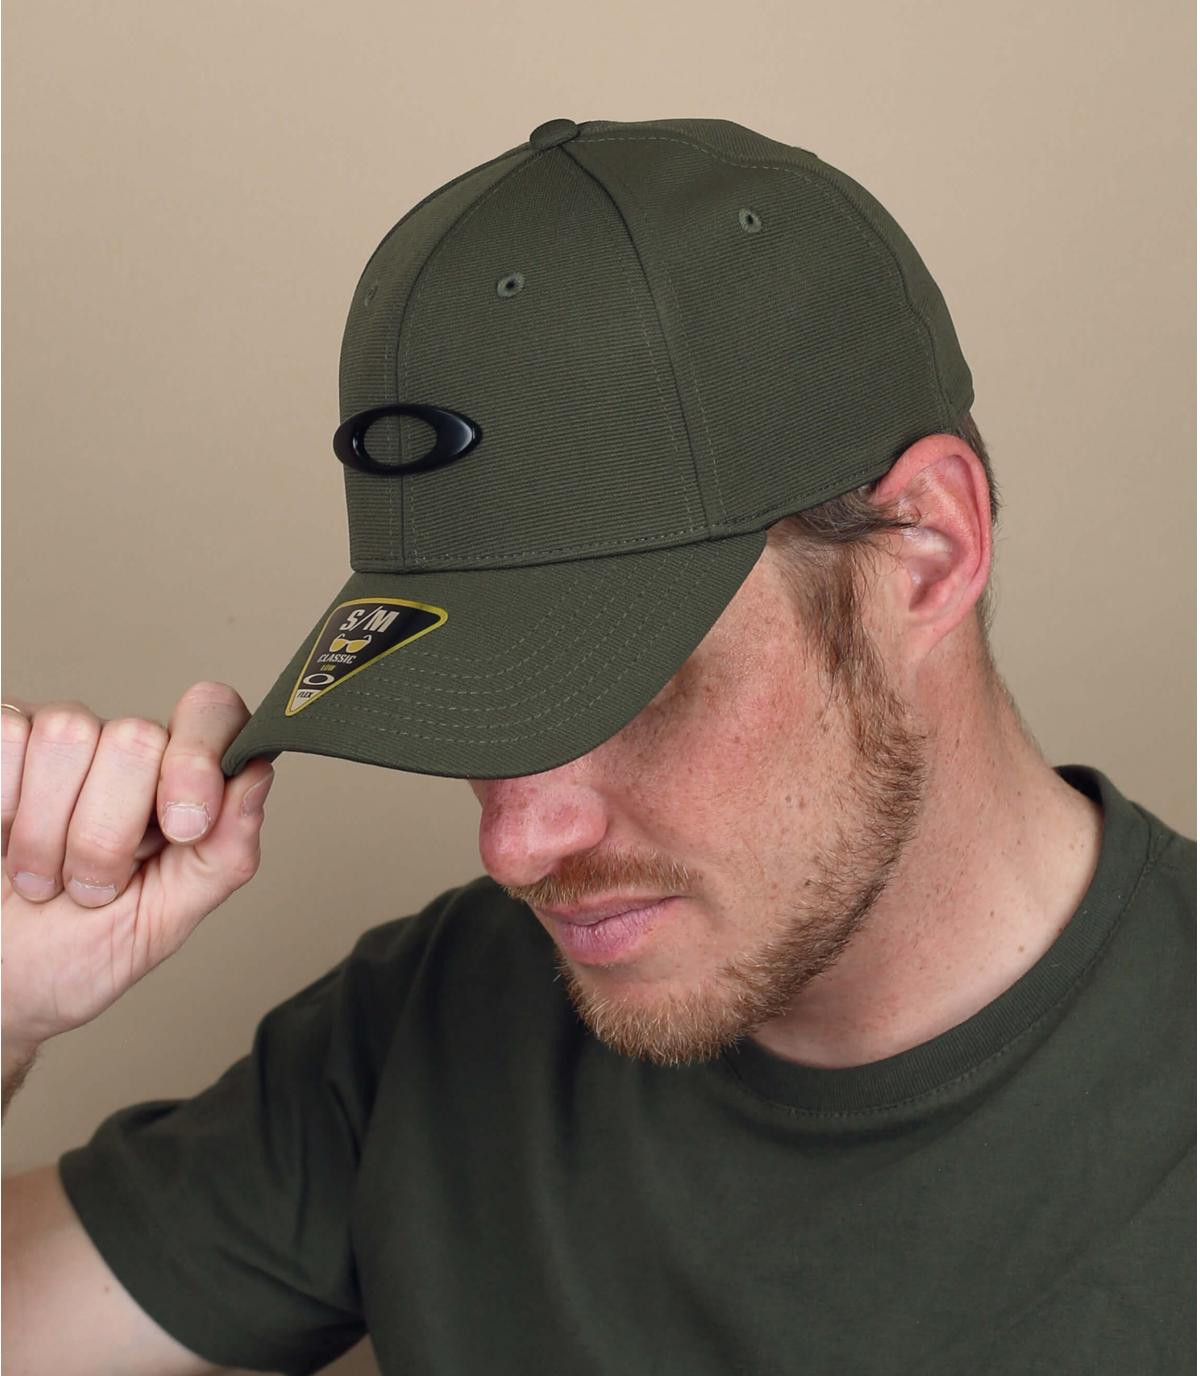 Green Oakley cap